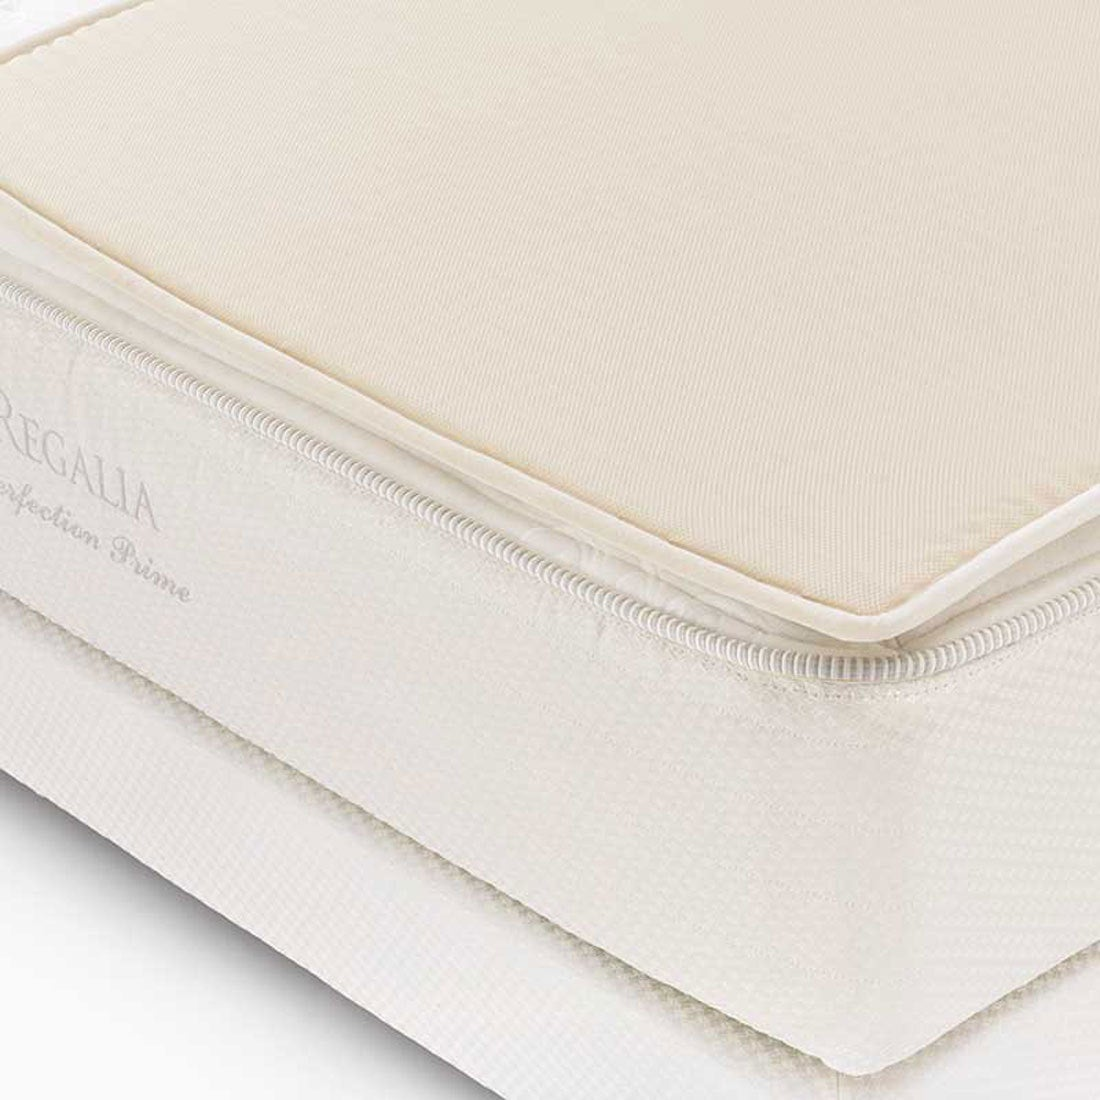 IDC OTSUKA/大塚家具 マットレスパッド ホームナースマット D W1400xD2000xH20(mm) (ホワイト)